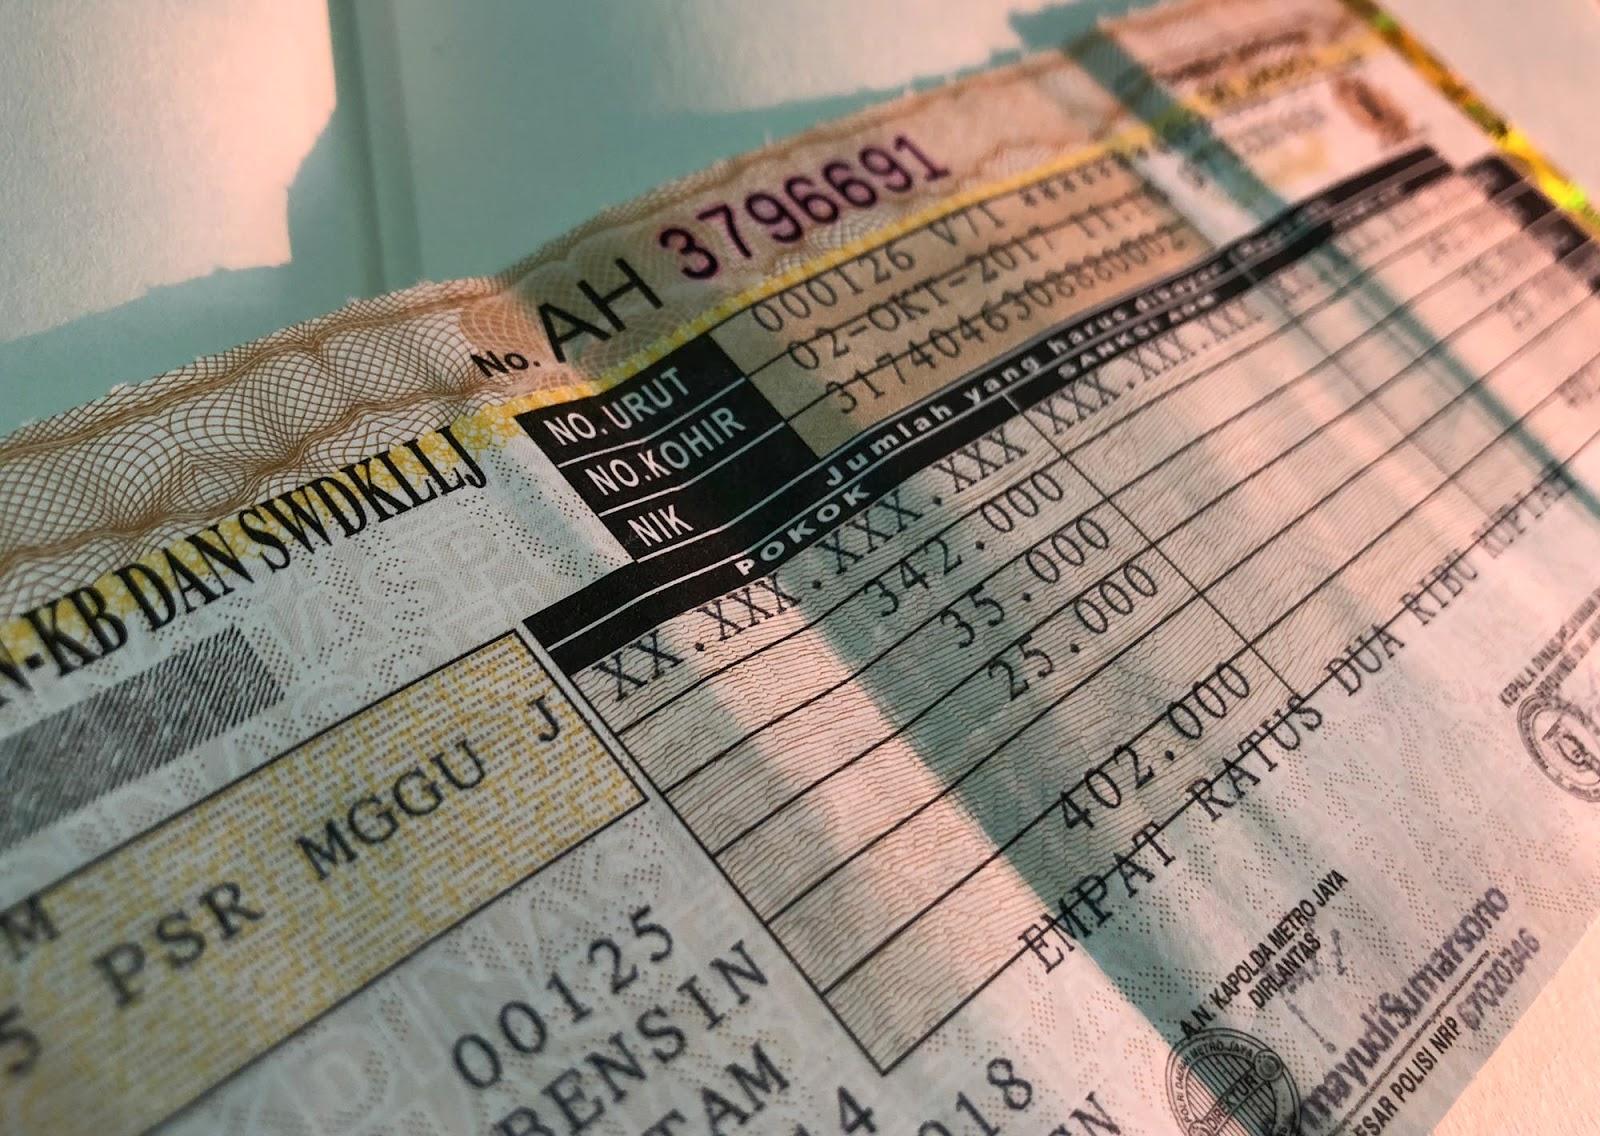 hindari-pajak-progresif-jual-kendaraan-dengan-balik-nama